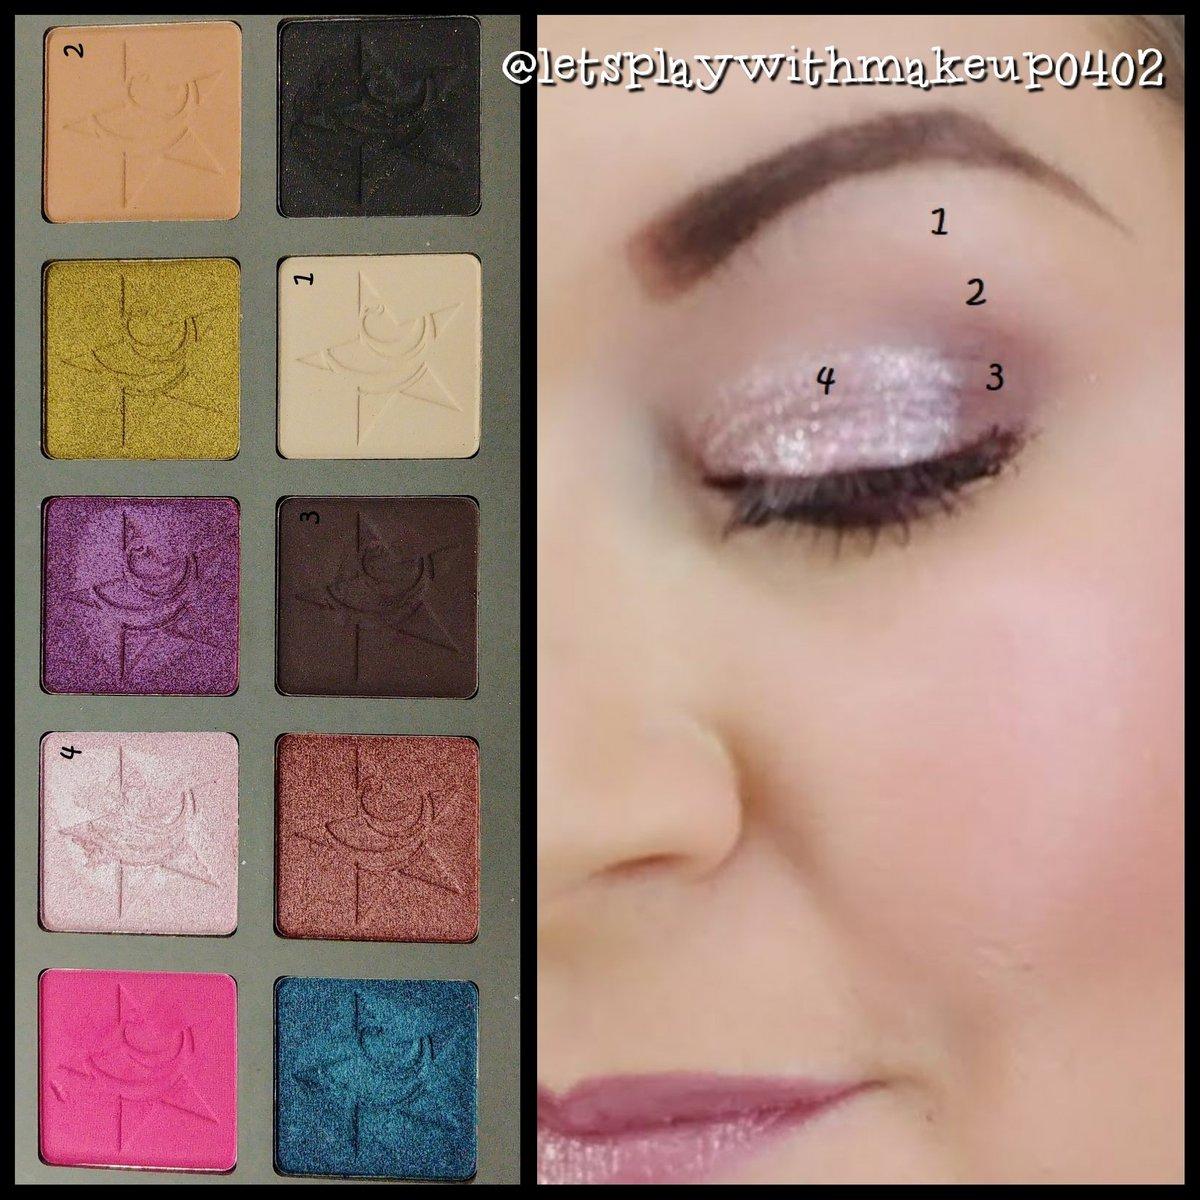 MOTD - @ccolorcosmetics Unisex 2 Palette #pictorial #makeuppictorial #motd #fotd #eotd #makeupaddict #beauty #makeup #mommymakeup #instaglam #instamakeup #eyeshadowlooks #eyelooks #ilovemakeup #mua #makeupjunkie #makeuplook #makeuplove #makeupartist #canadiangirl #canadianmuapic.twitter.com/rl35Gop11u